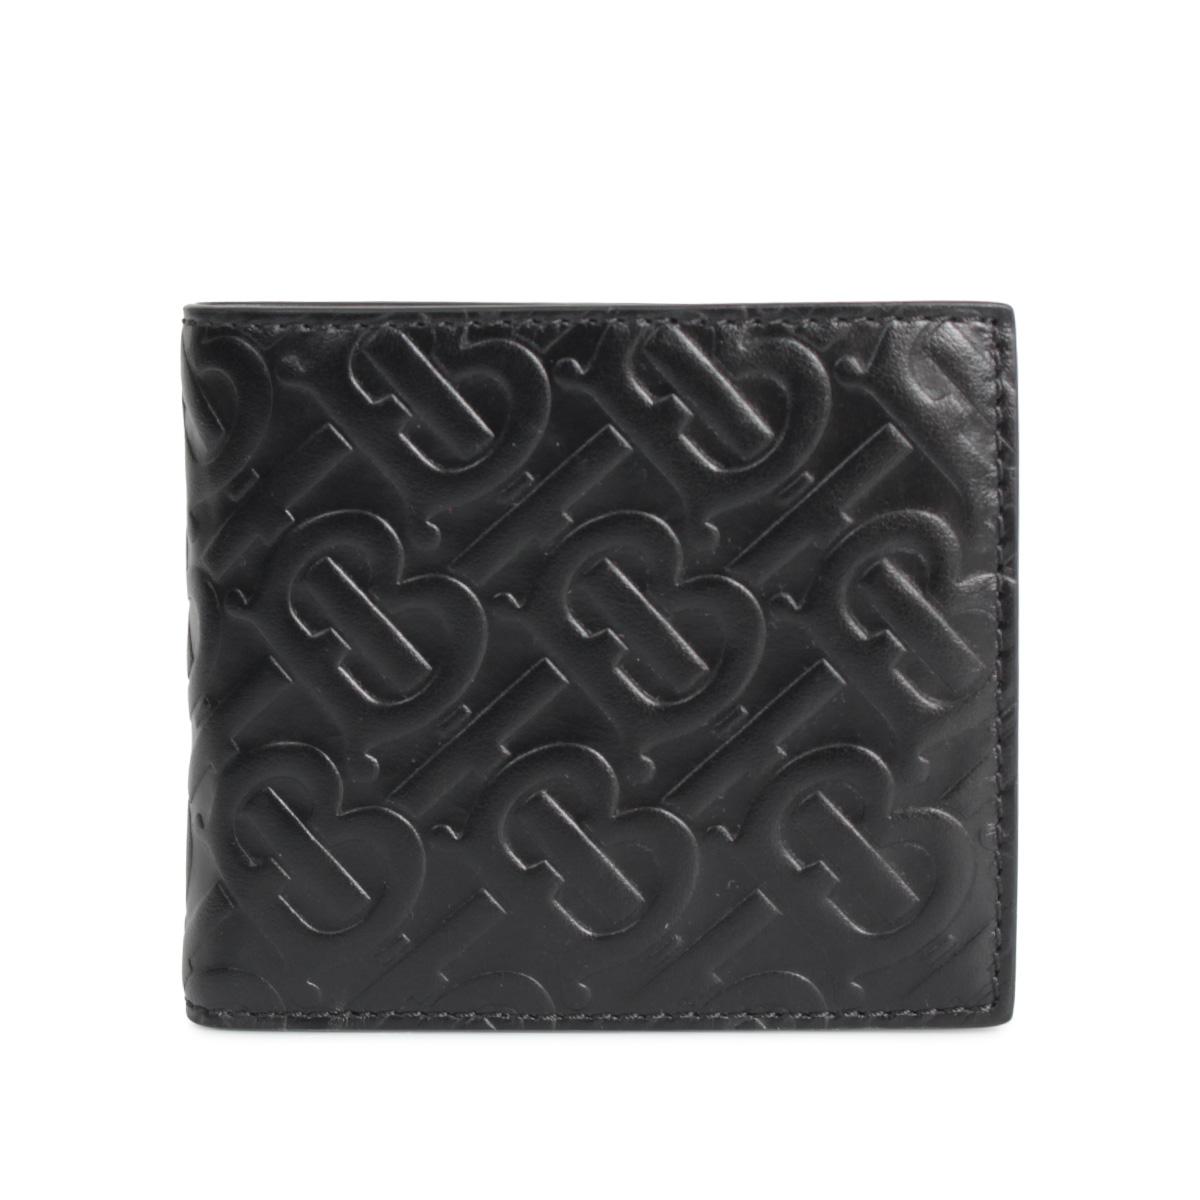 BURBERRY MONOGRAMED LEATHER BILL COIN WALLET バーバリー 財布 二つ折り メンズ ブラック 黒 8017655